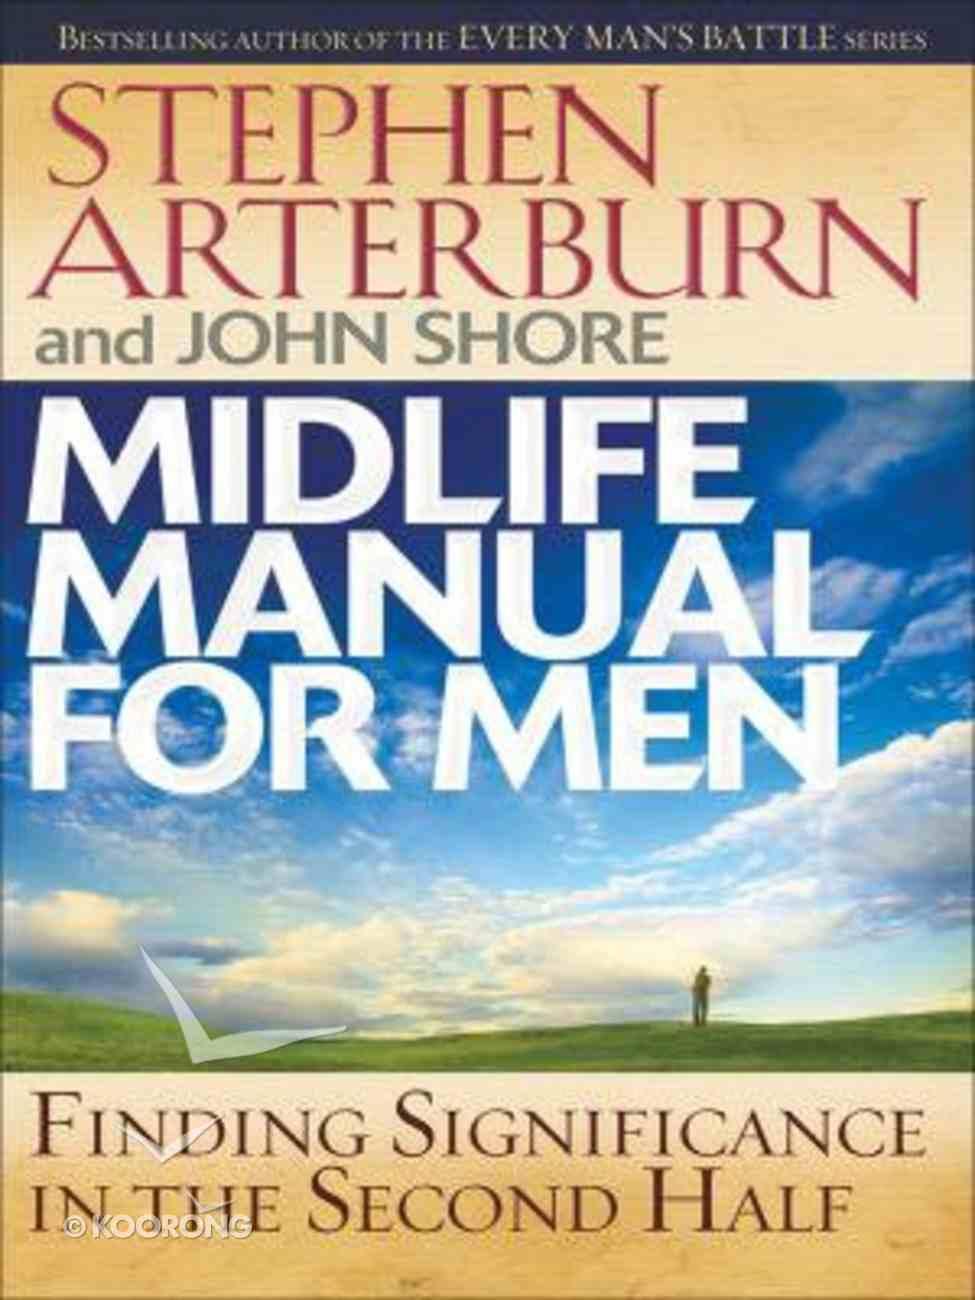 Midlife Manual For Men (Large Print) Paperback